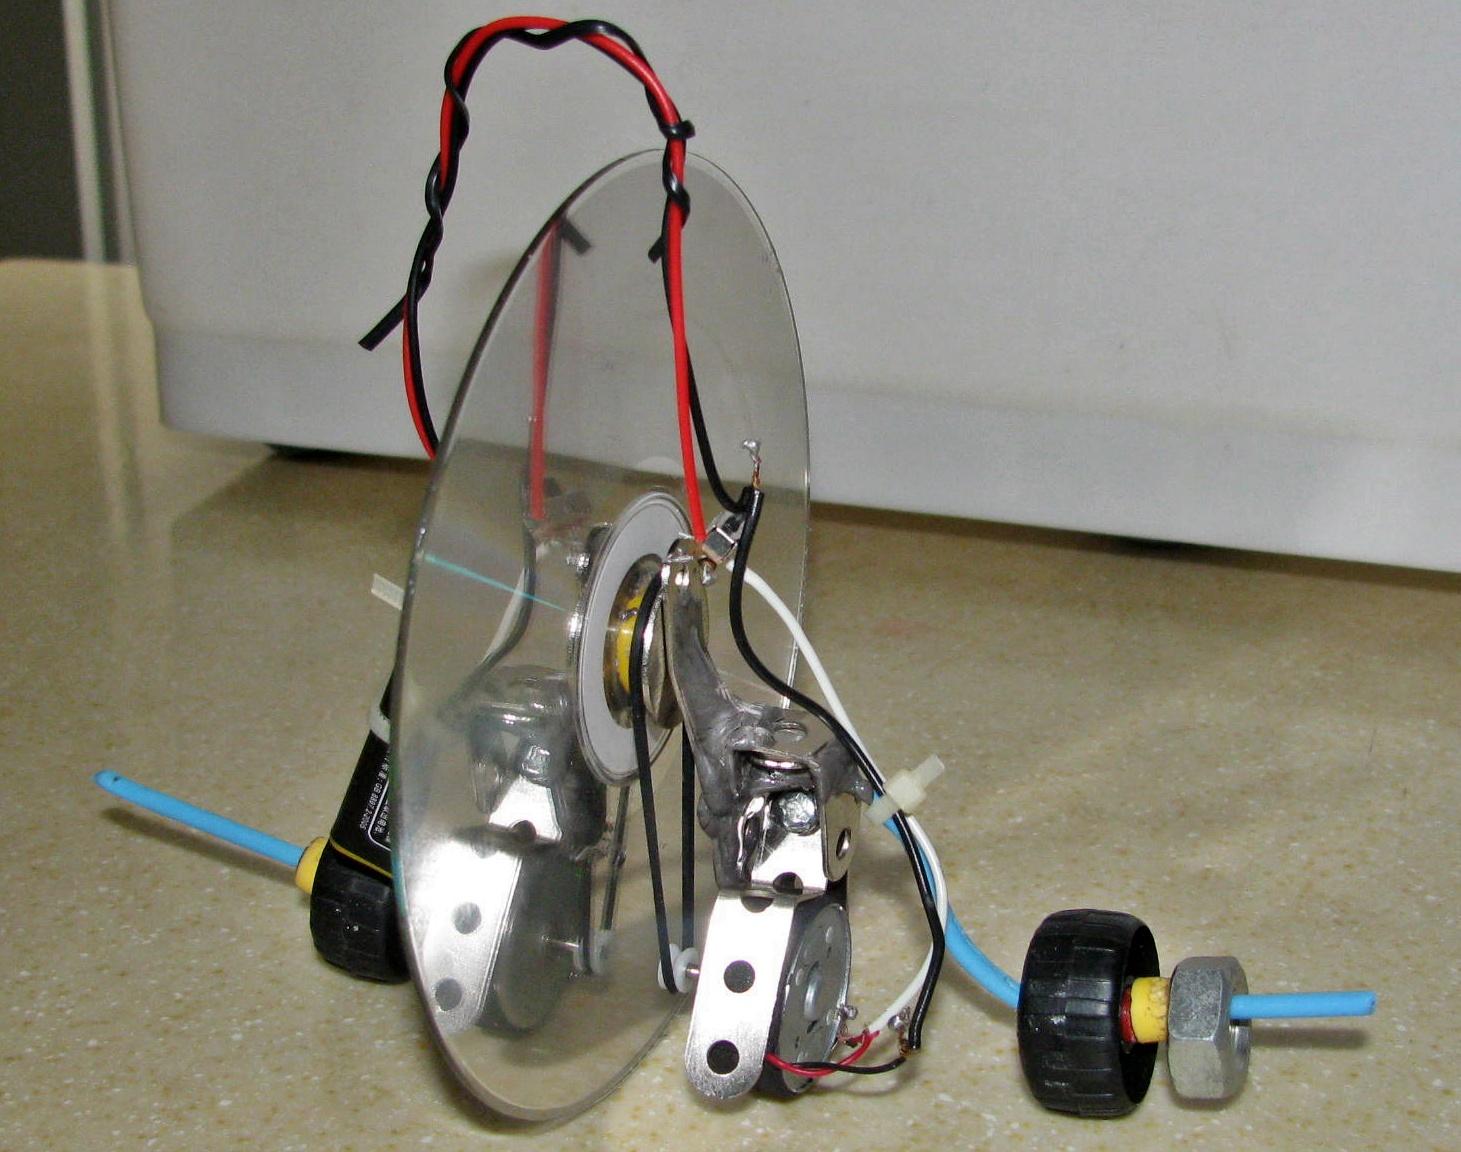 Motorized Uniwheel Toy Thing (Mutt)